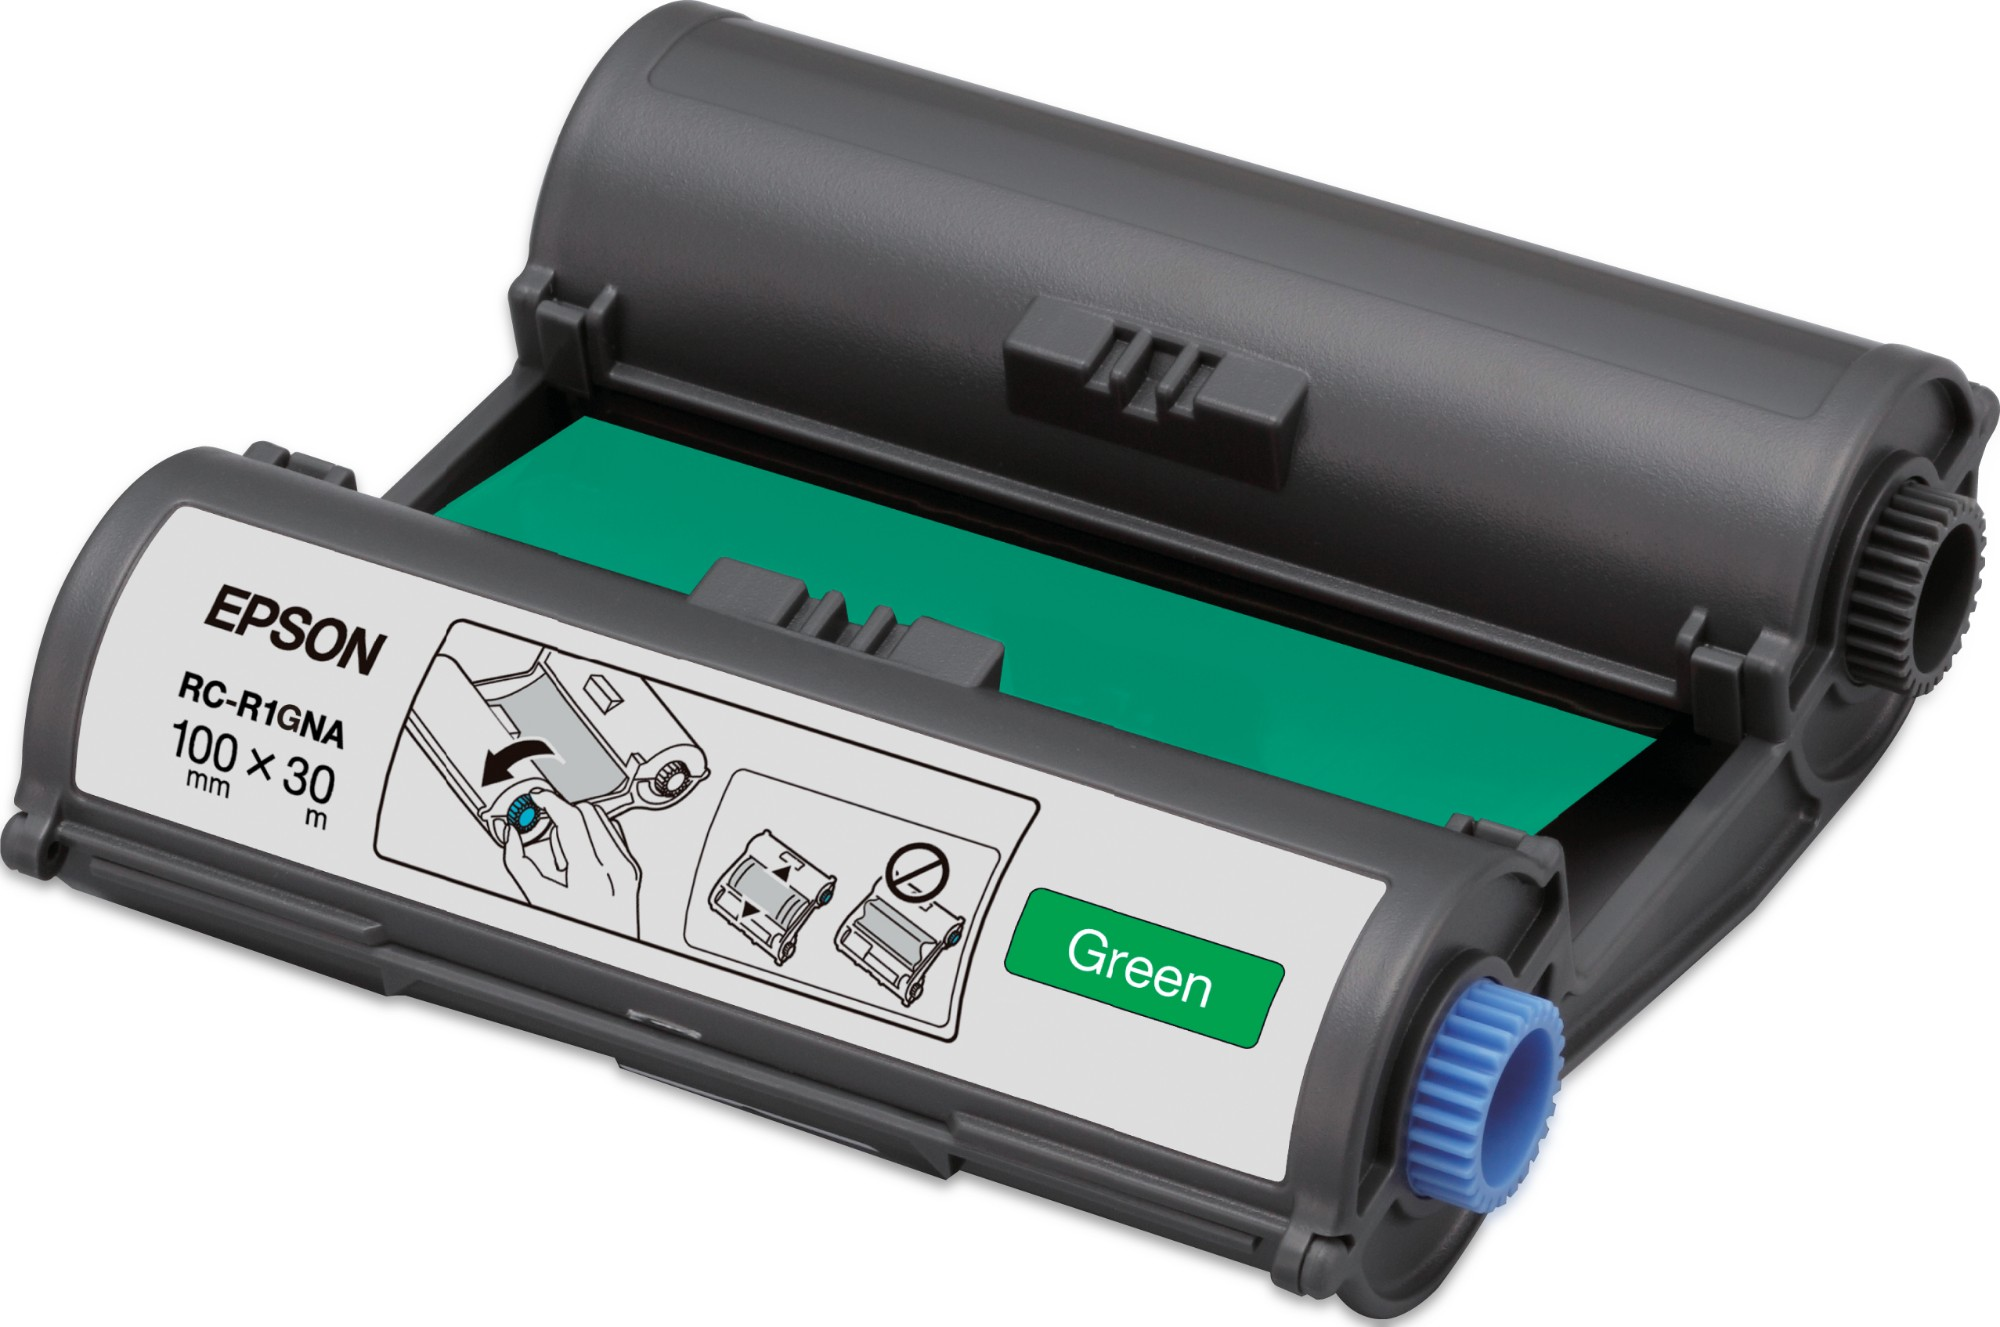 Epson Cinta RC-R1GNA verde 100 mm